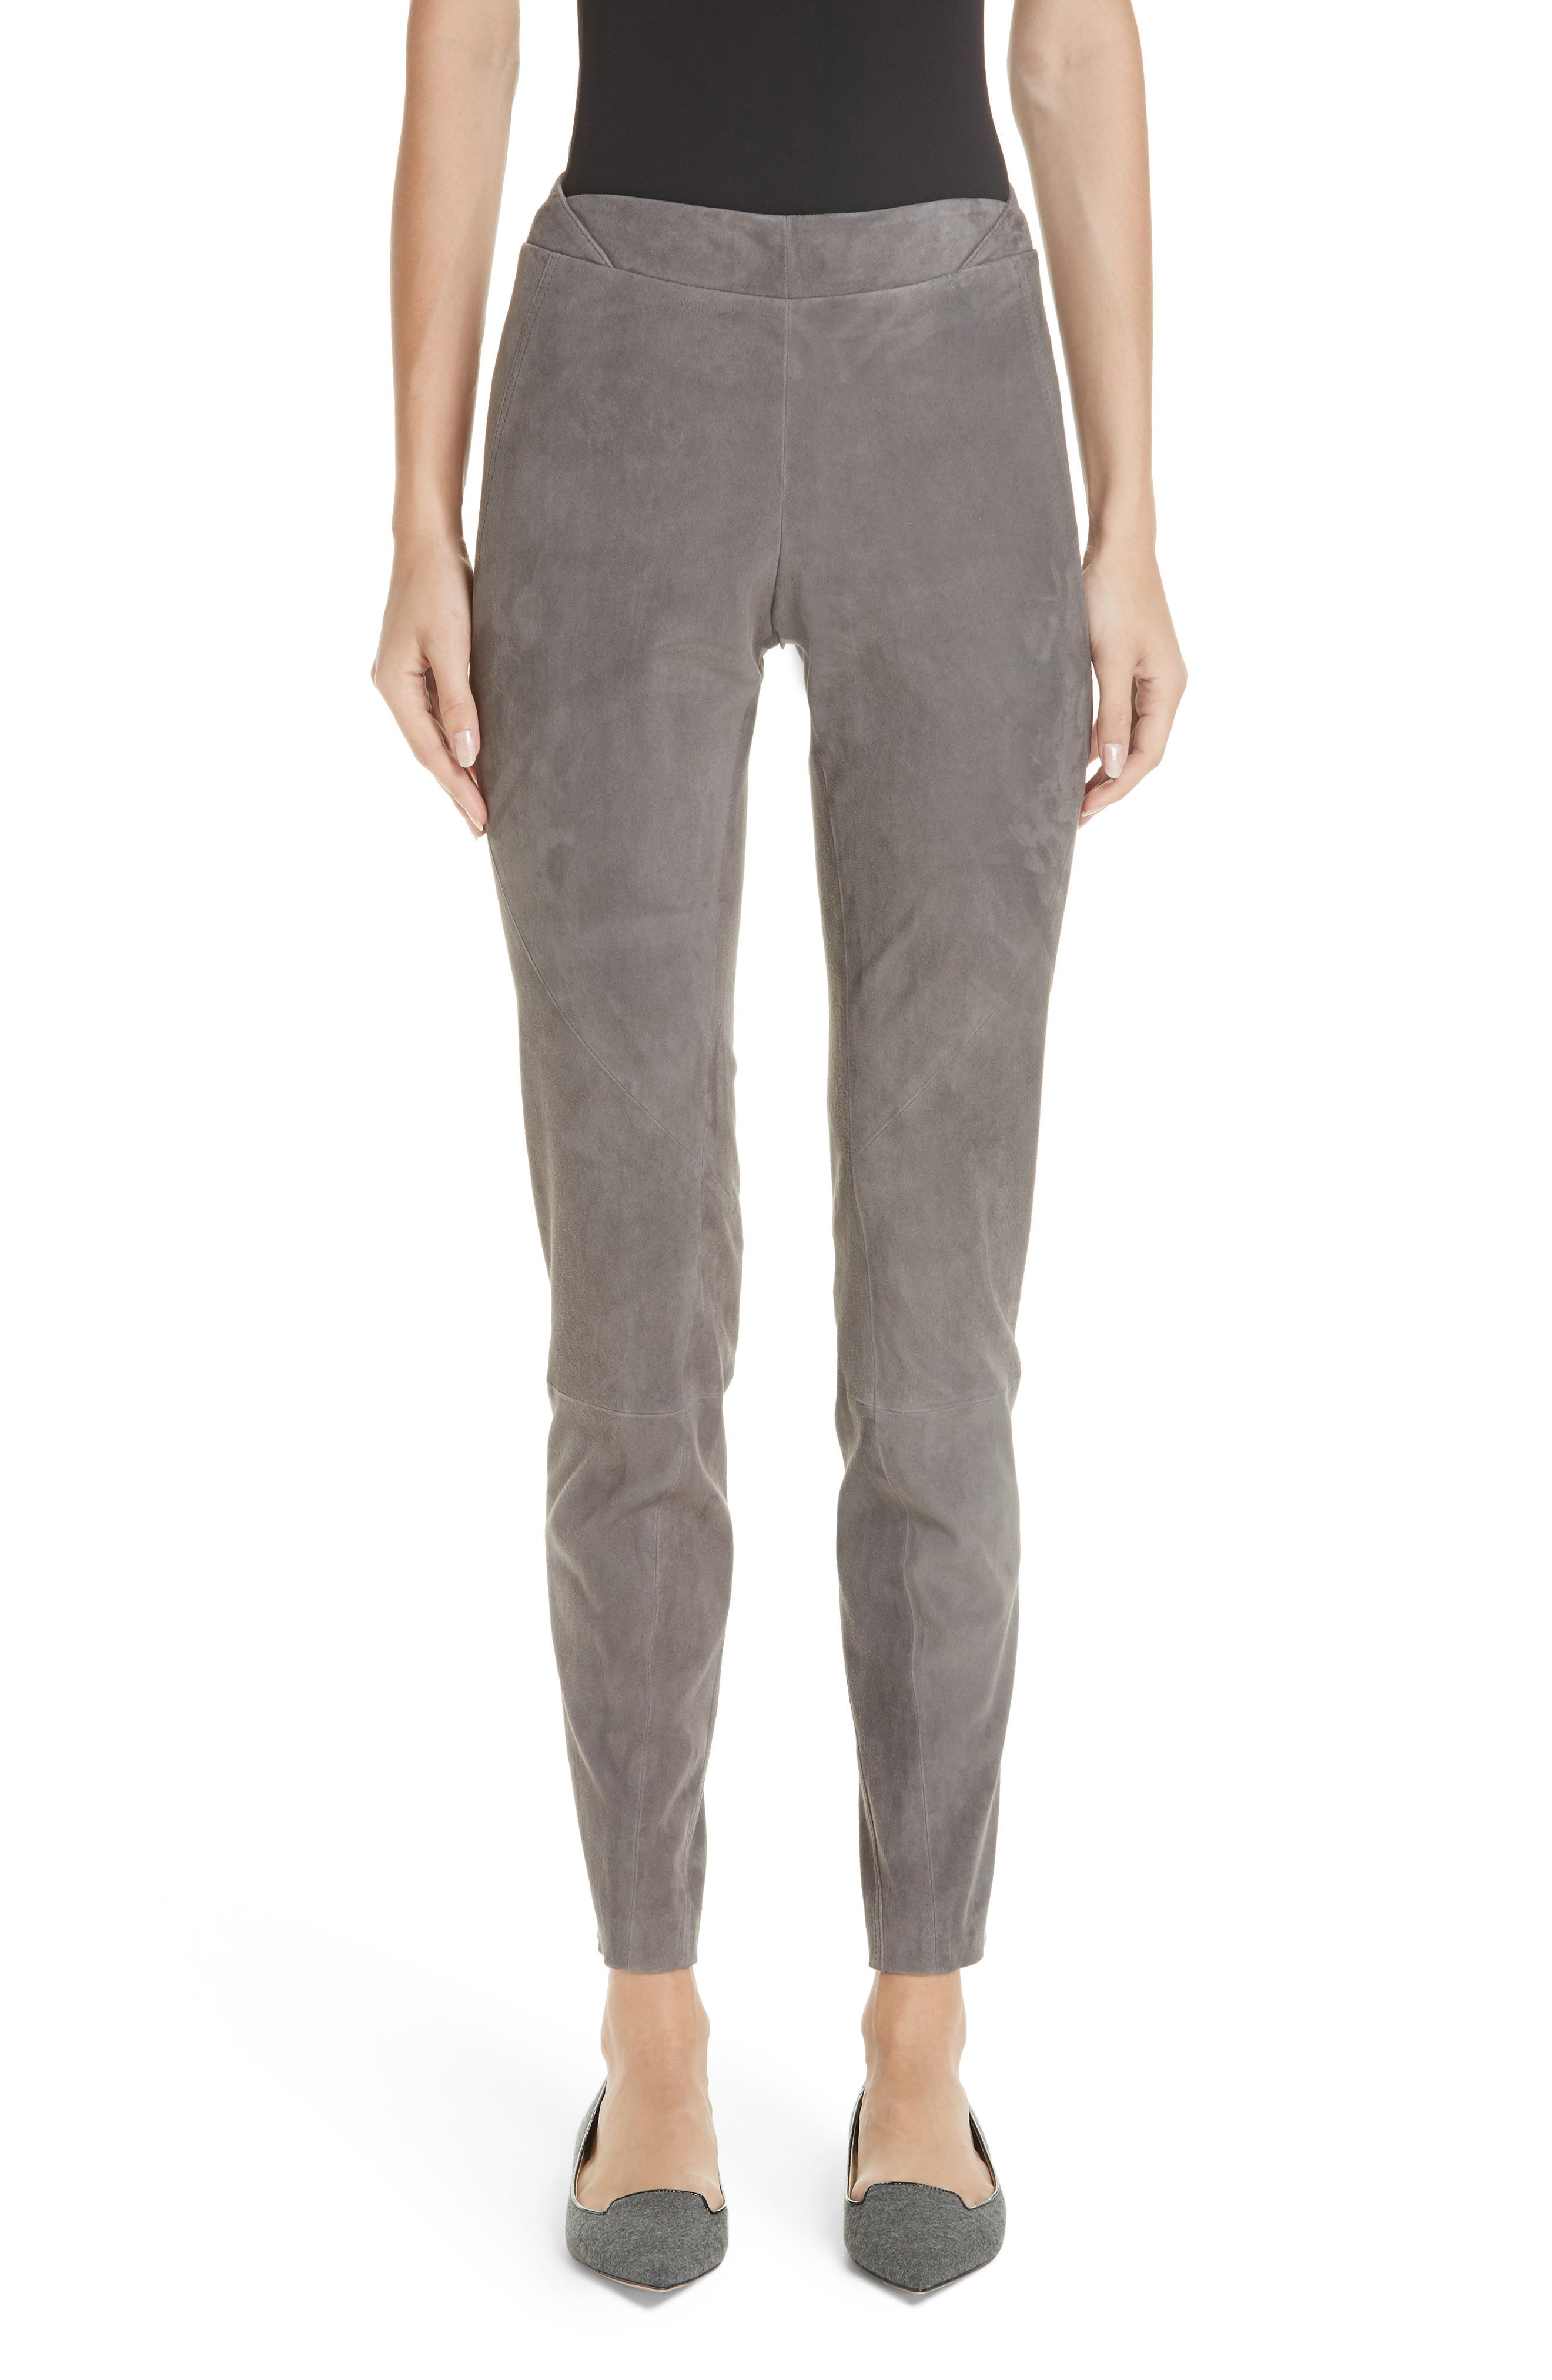 Brooklyn Suede Pants,                         Main,                         color, ROCK